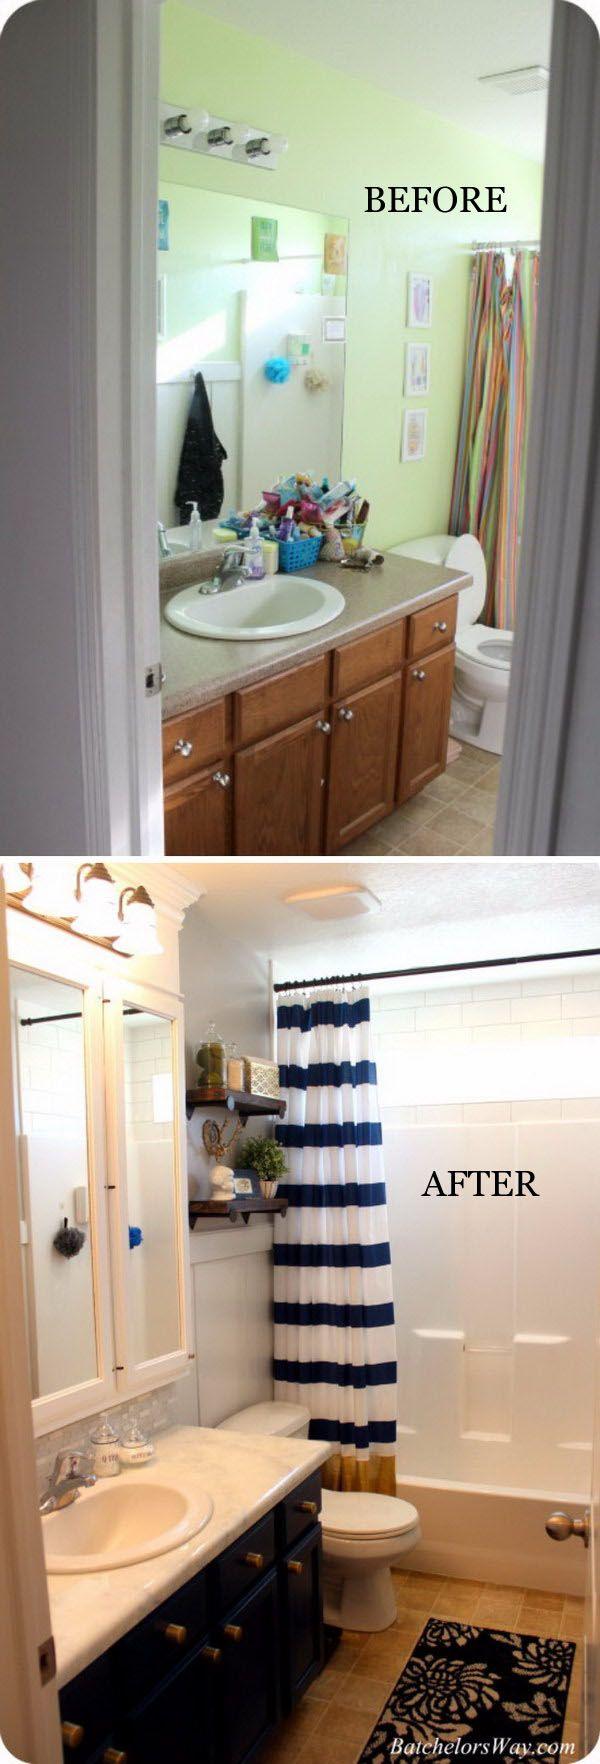 Best 25 bathroom remodeling ideas on pinterest bathroom - Small bathroom remodels on a budget ...